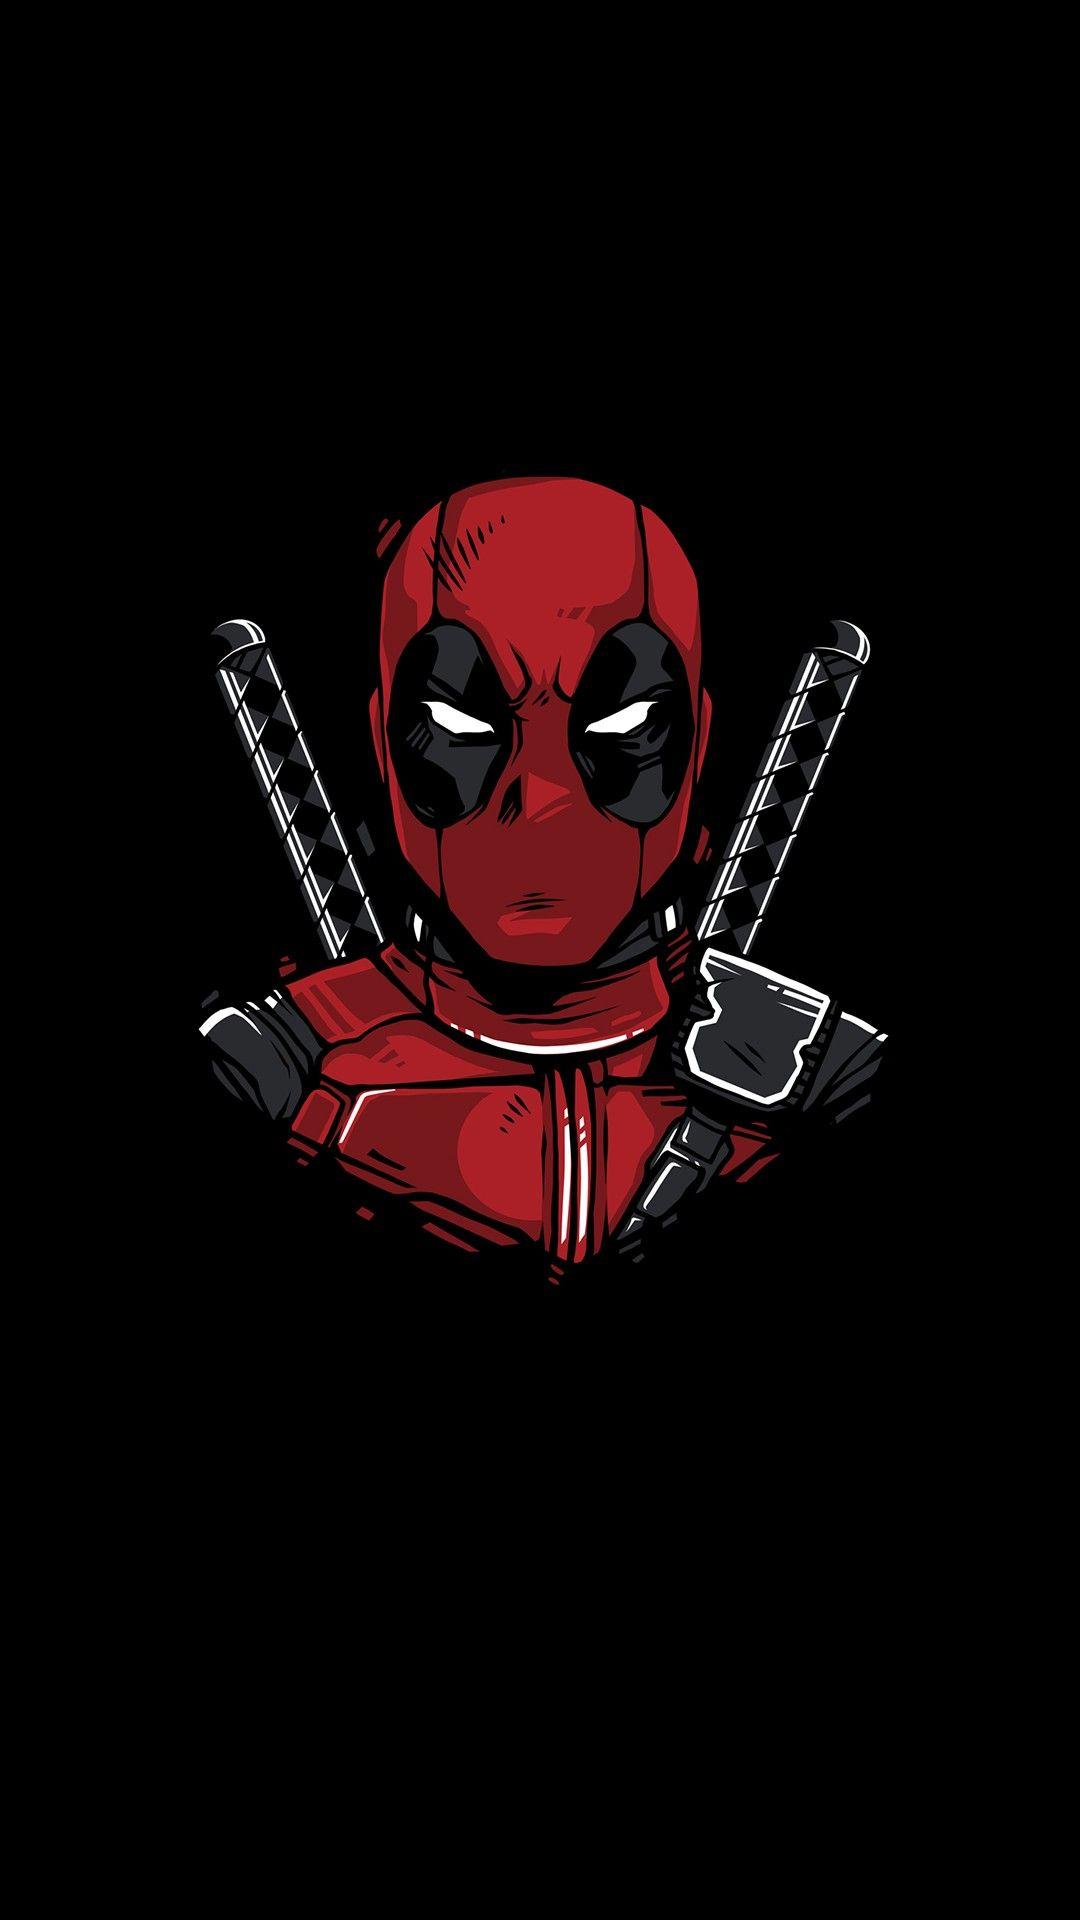 Download Deadpool Wallpaper For Iphone Wallpaper